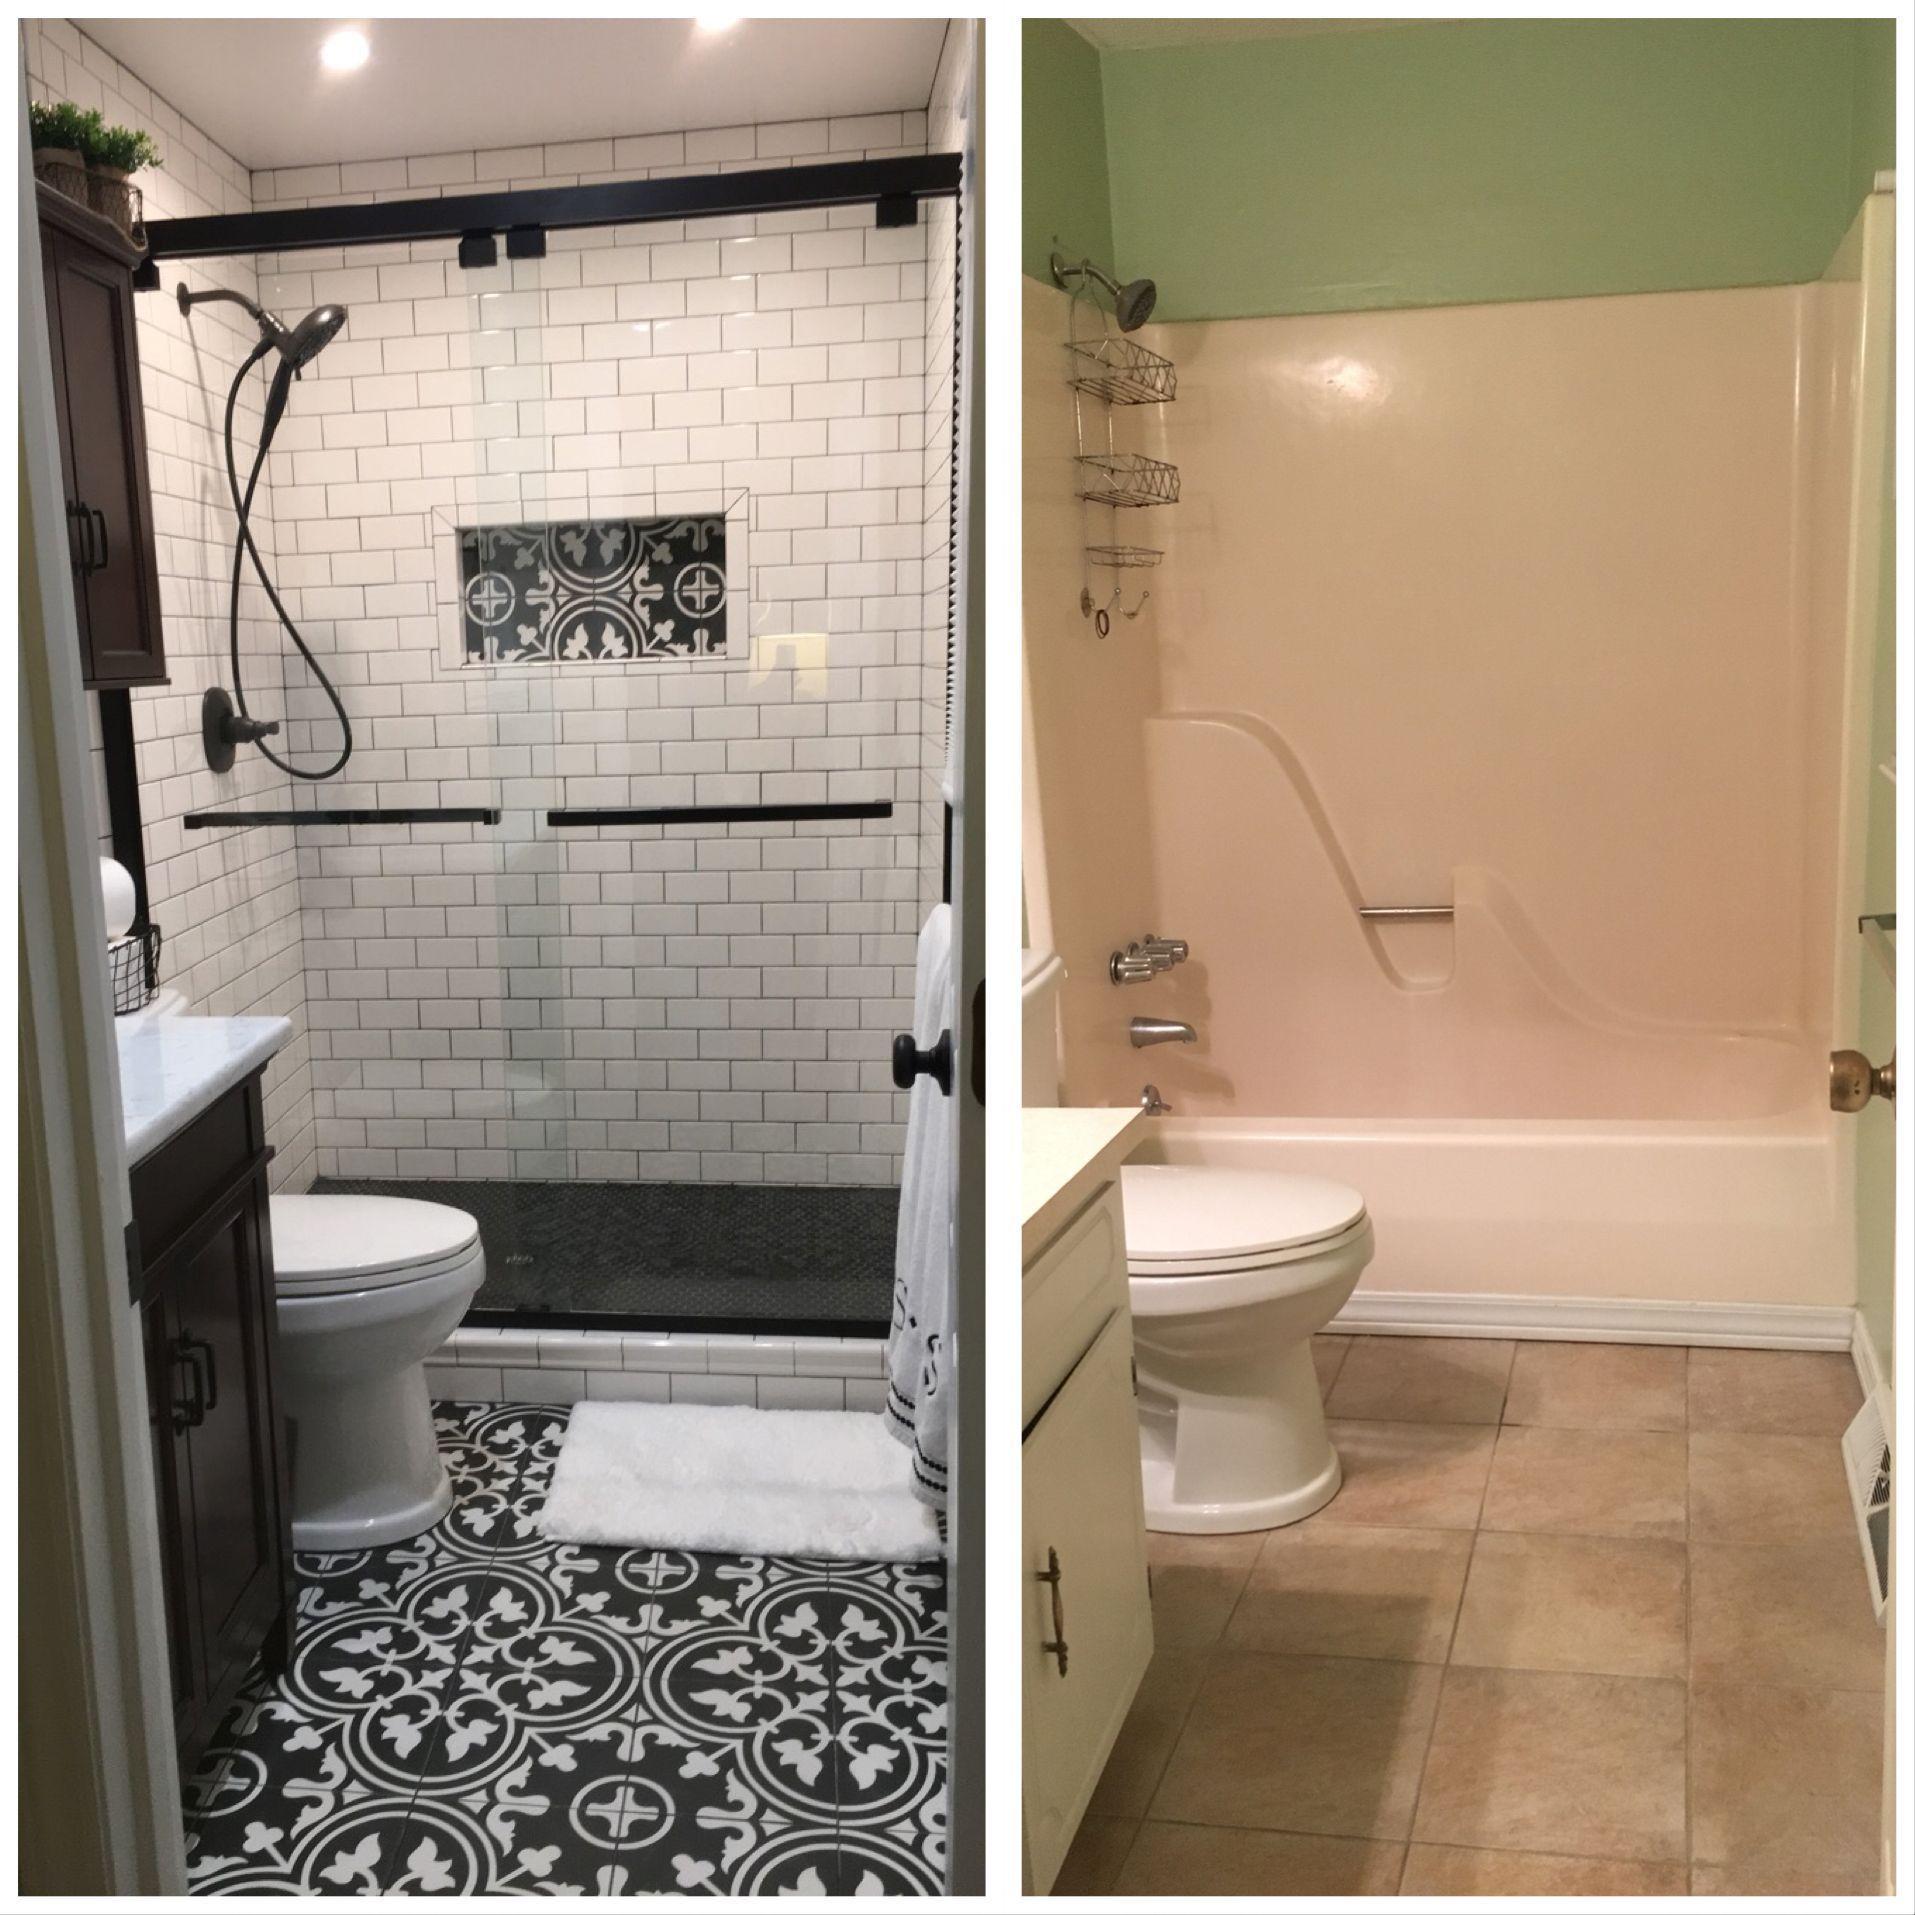 25 Minimalist Small Bathroom Ideas Feel The Big Space Restroom